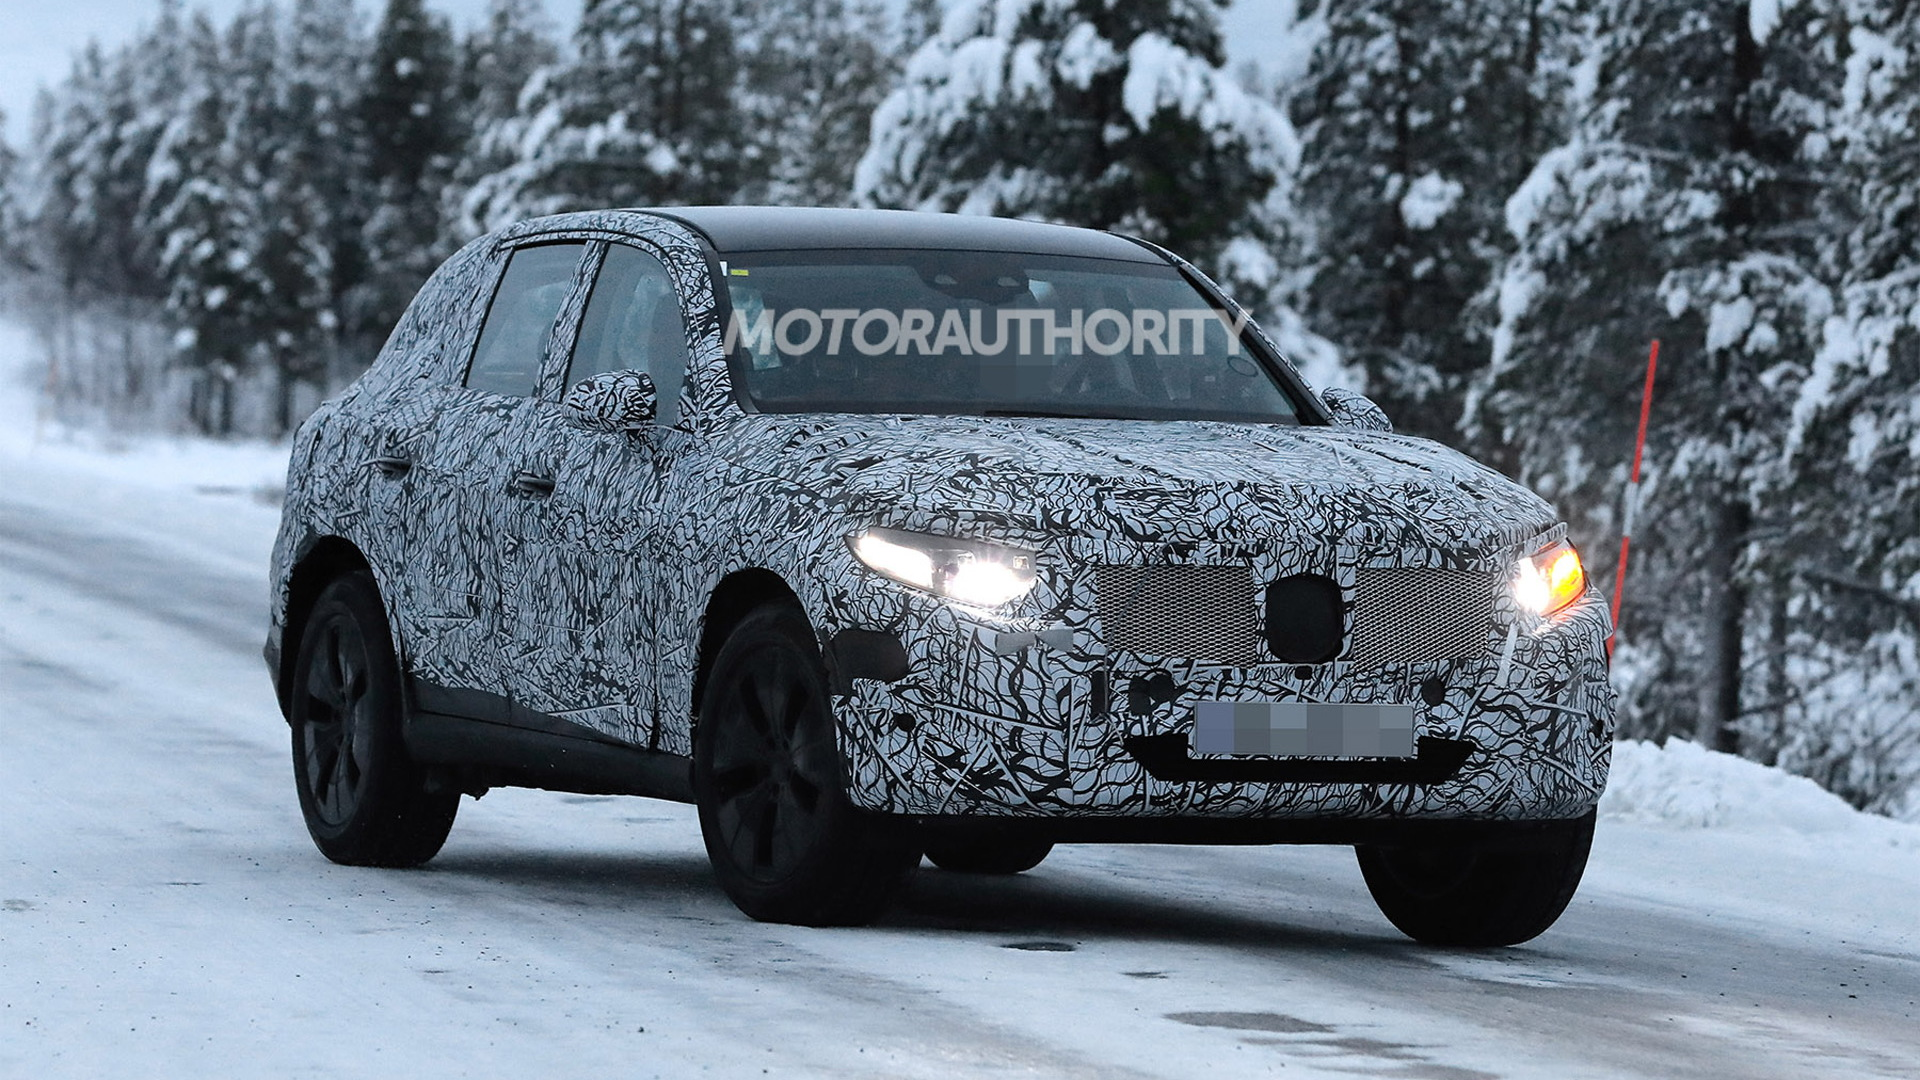 2023 Mercedes-Benz GLC-Class spy shots - Photo credit: S. Baldauf/SB-Medien